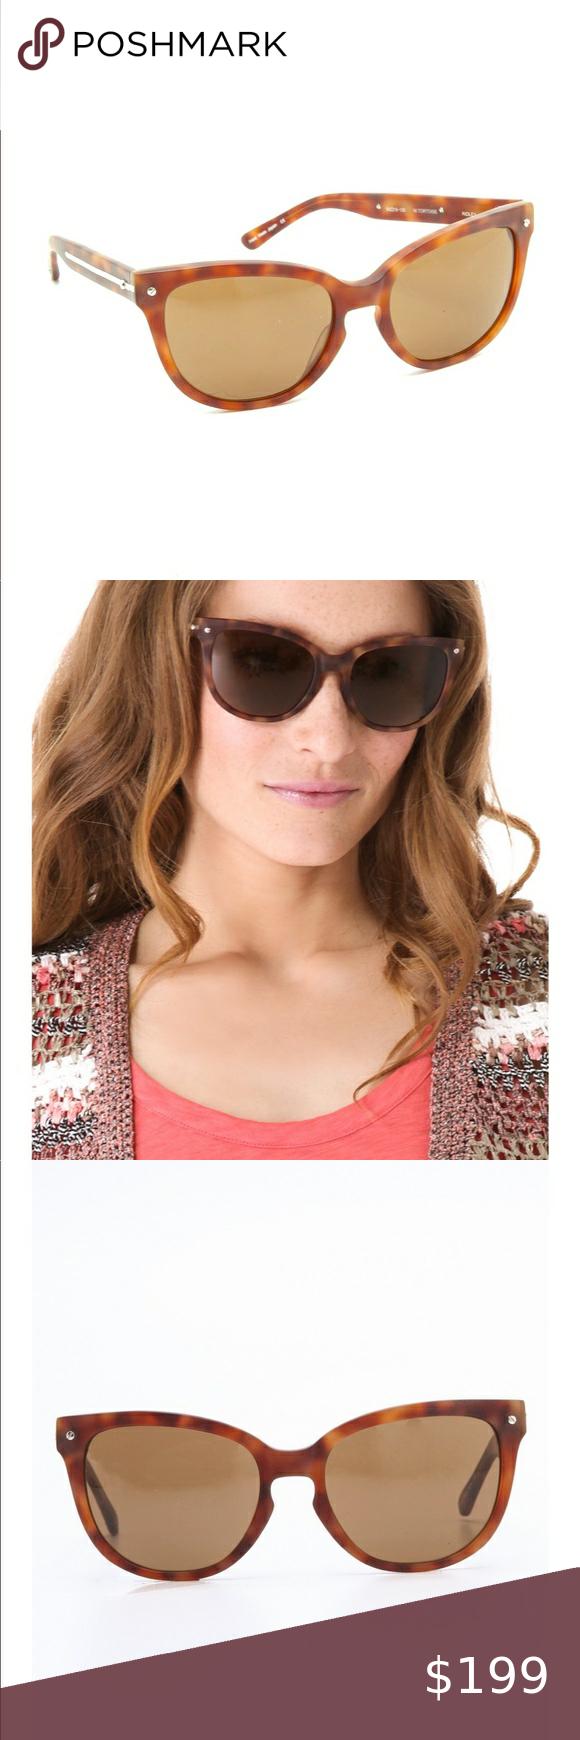 Rag Bone Sunglasses In 2020 Sunglasses Cool Sunglasses Rag Bone